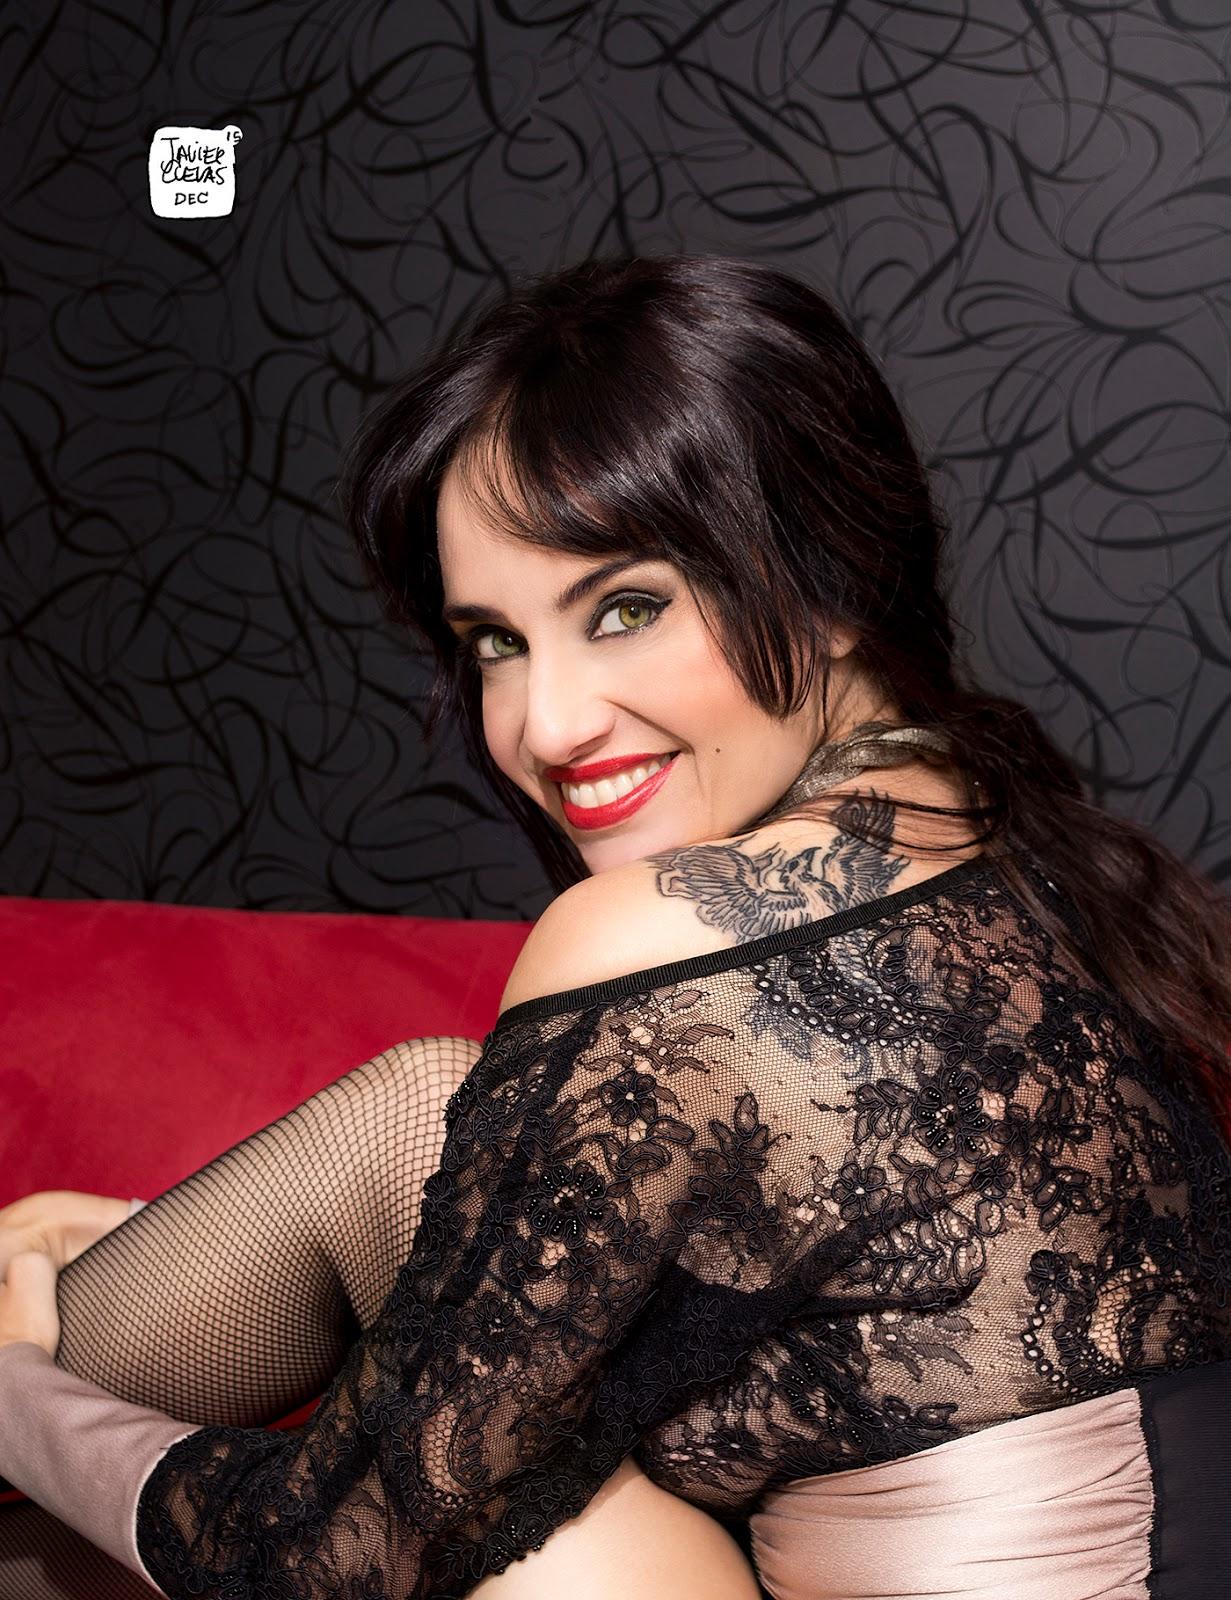 Beatriz Rico nudes (36 images) Tits, Facebook, panties